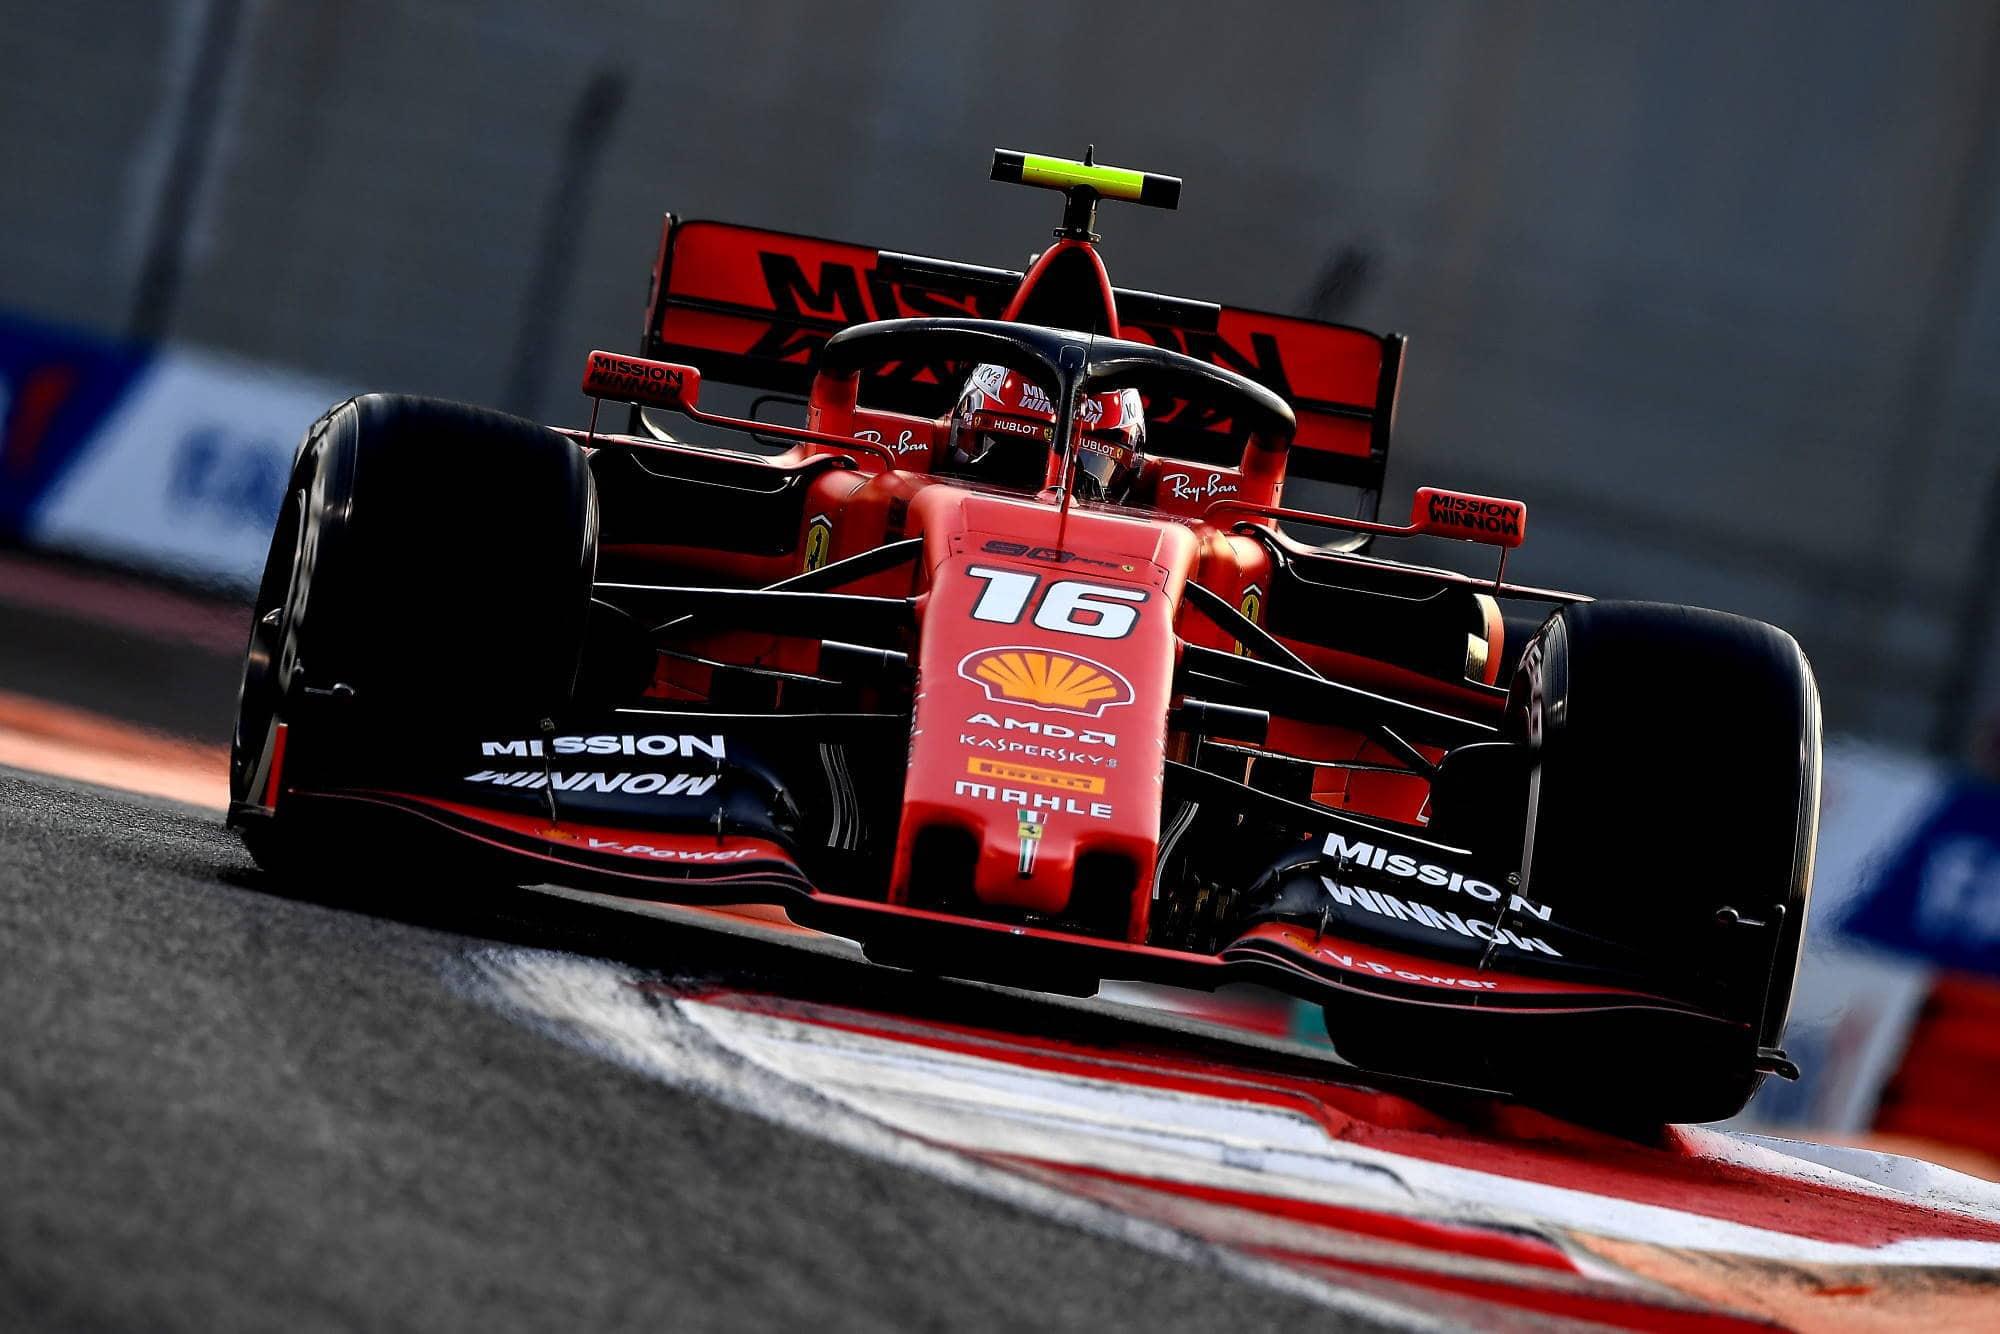 Leclerc Ferrari Abu Dhabi GP F1 2019 night Photo Ferrari